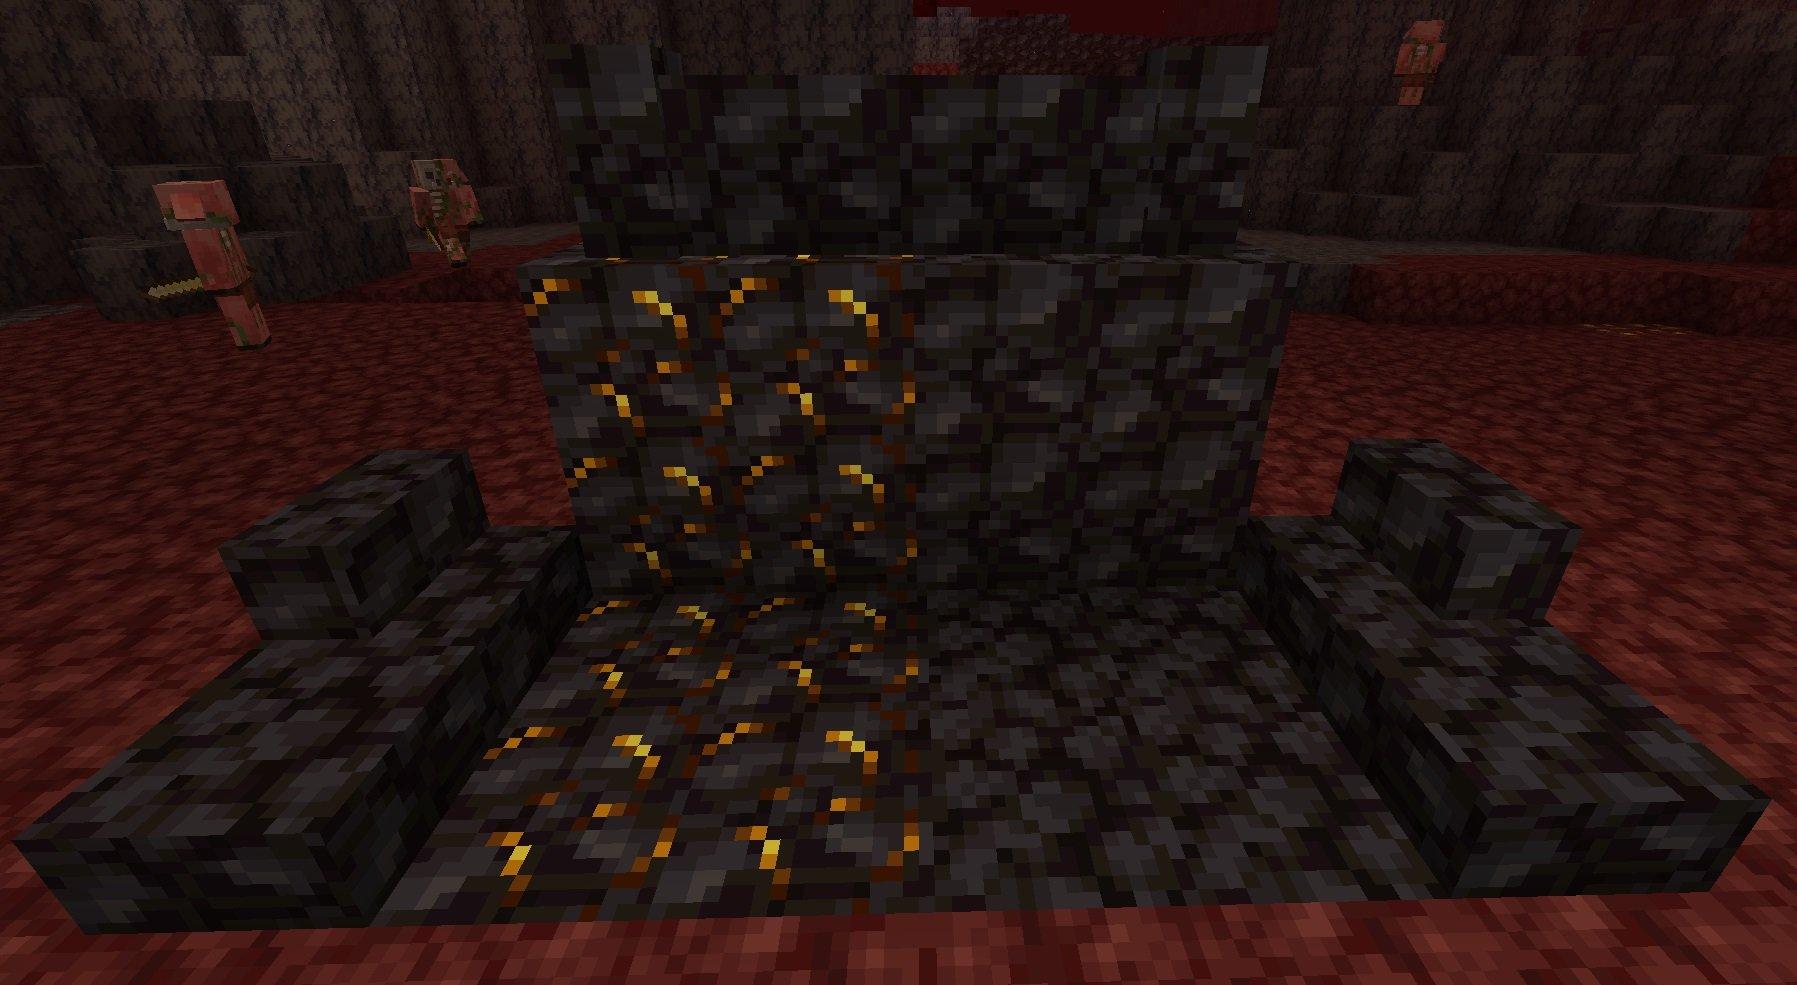 ciemny kamien pozlacany ciemy kamien plytki murek murek